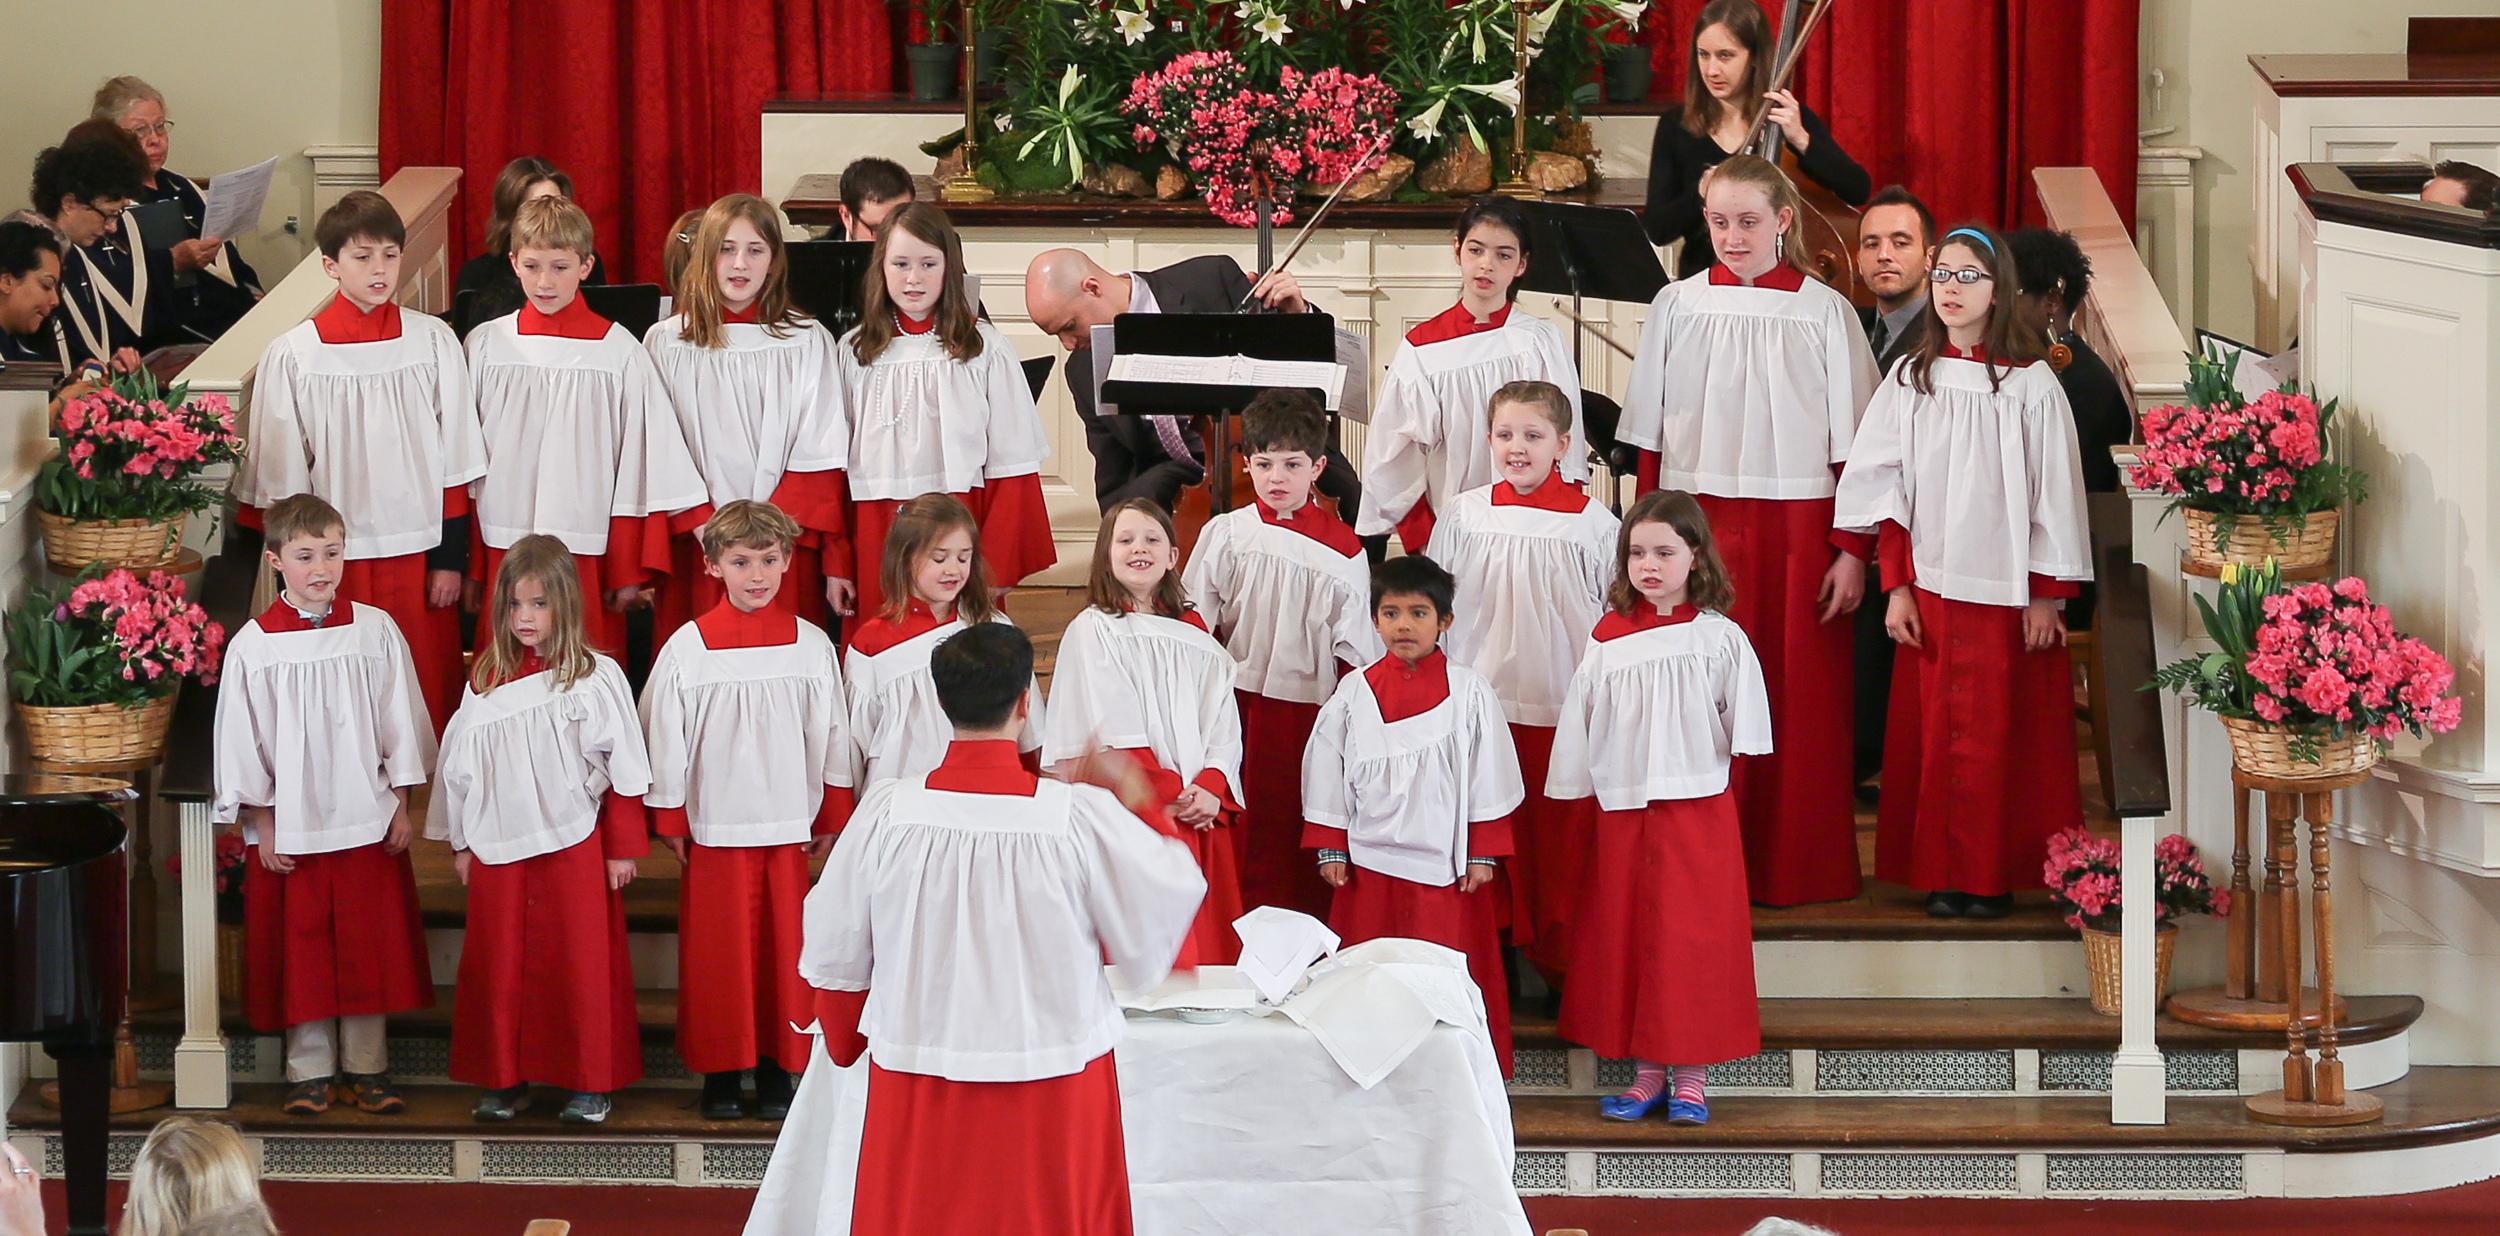 Children's Choir at Easter